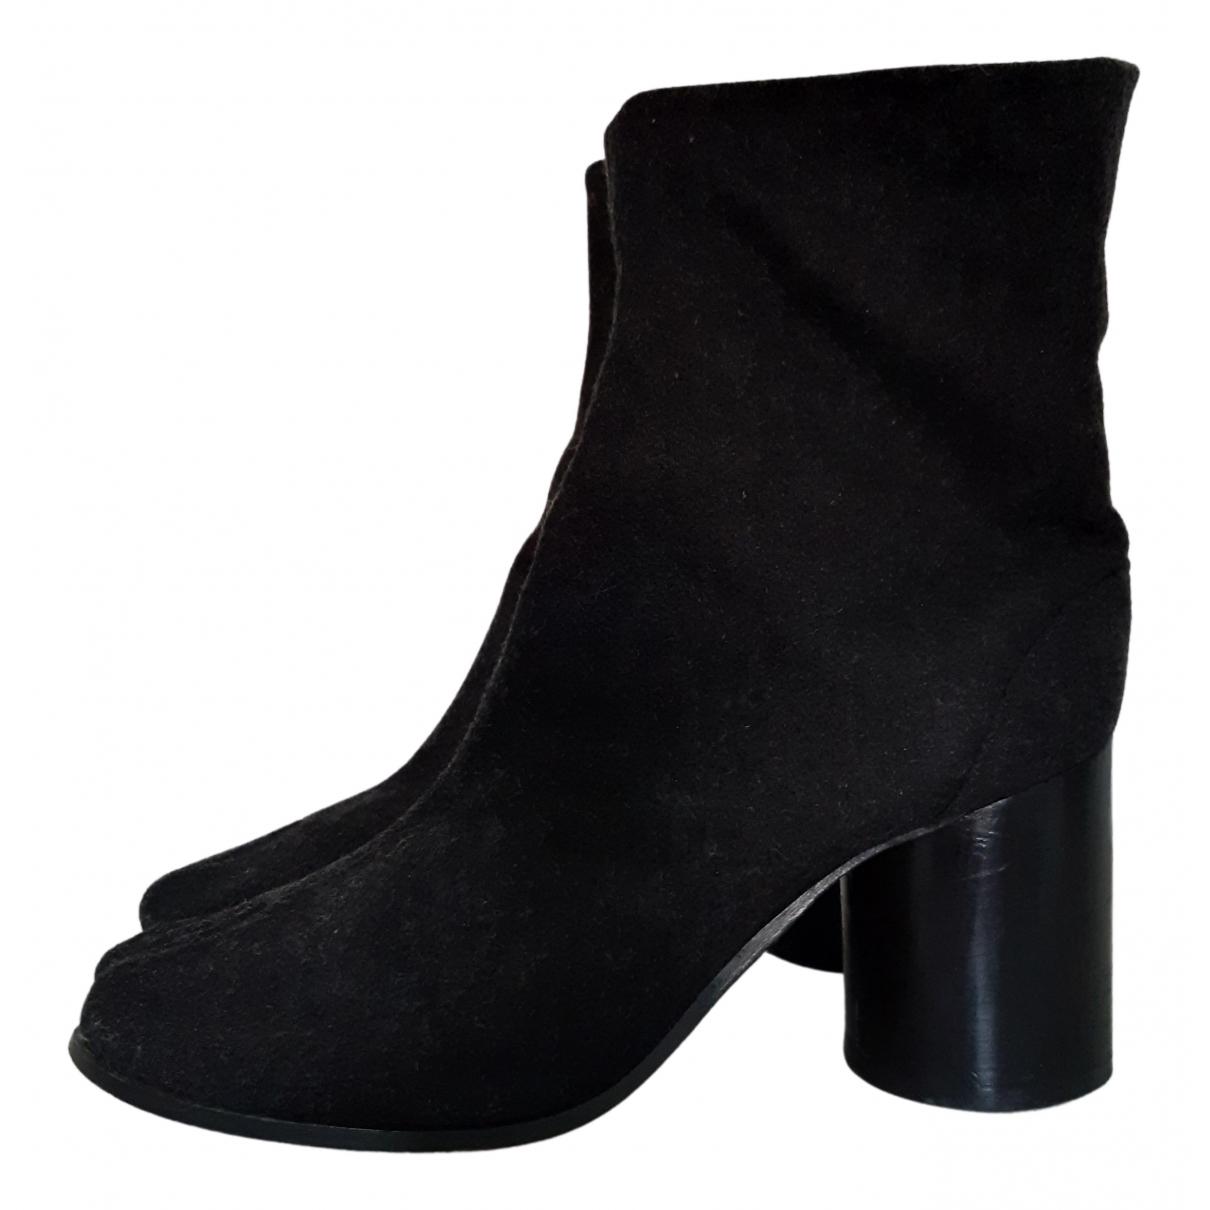 Maison Martin Margiela Tabi Anthracite Tweed Ankle boots for Women 39 EU